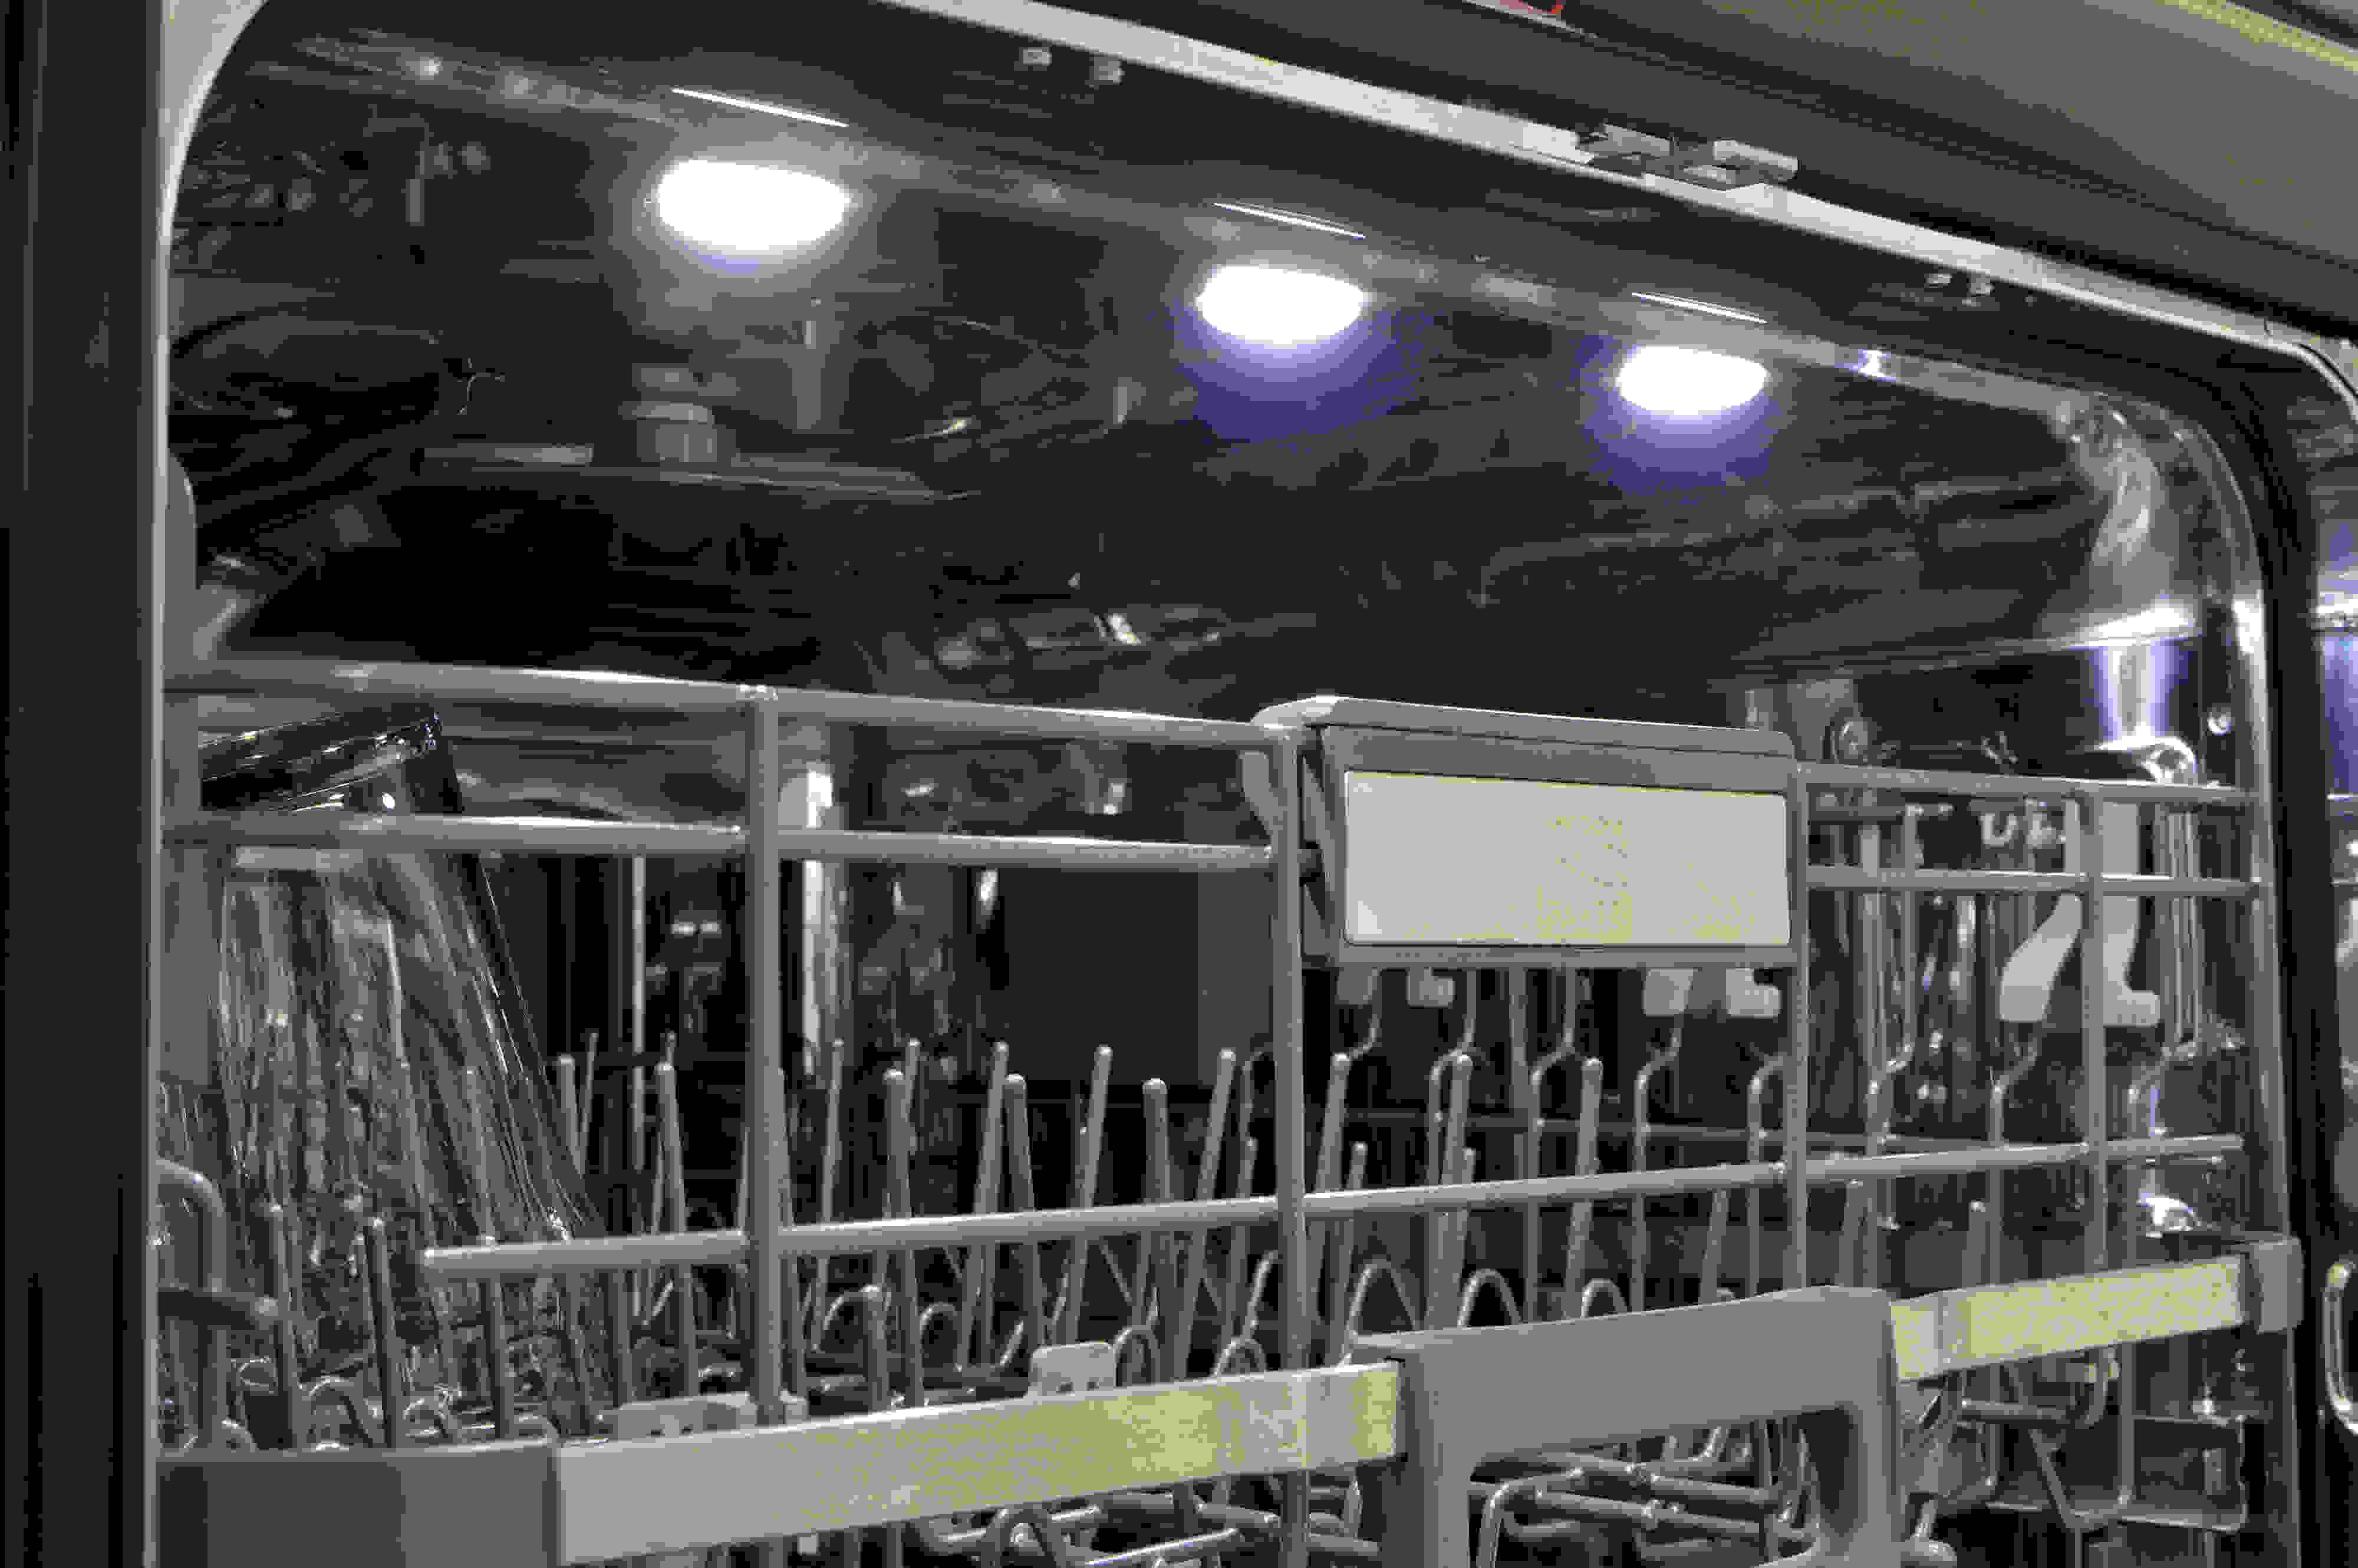 Three lights inside the dishwasher